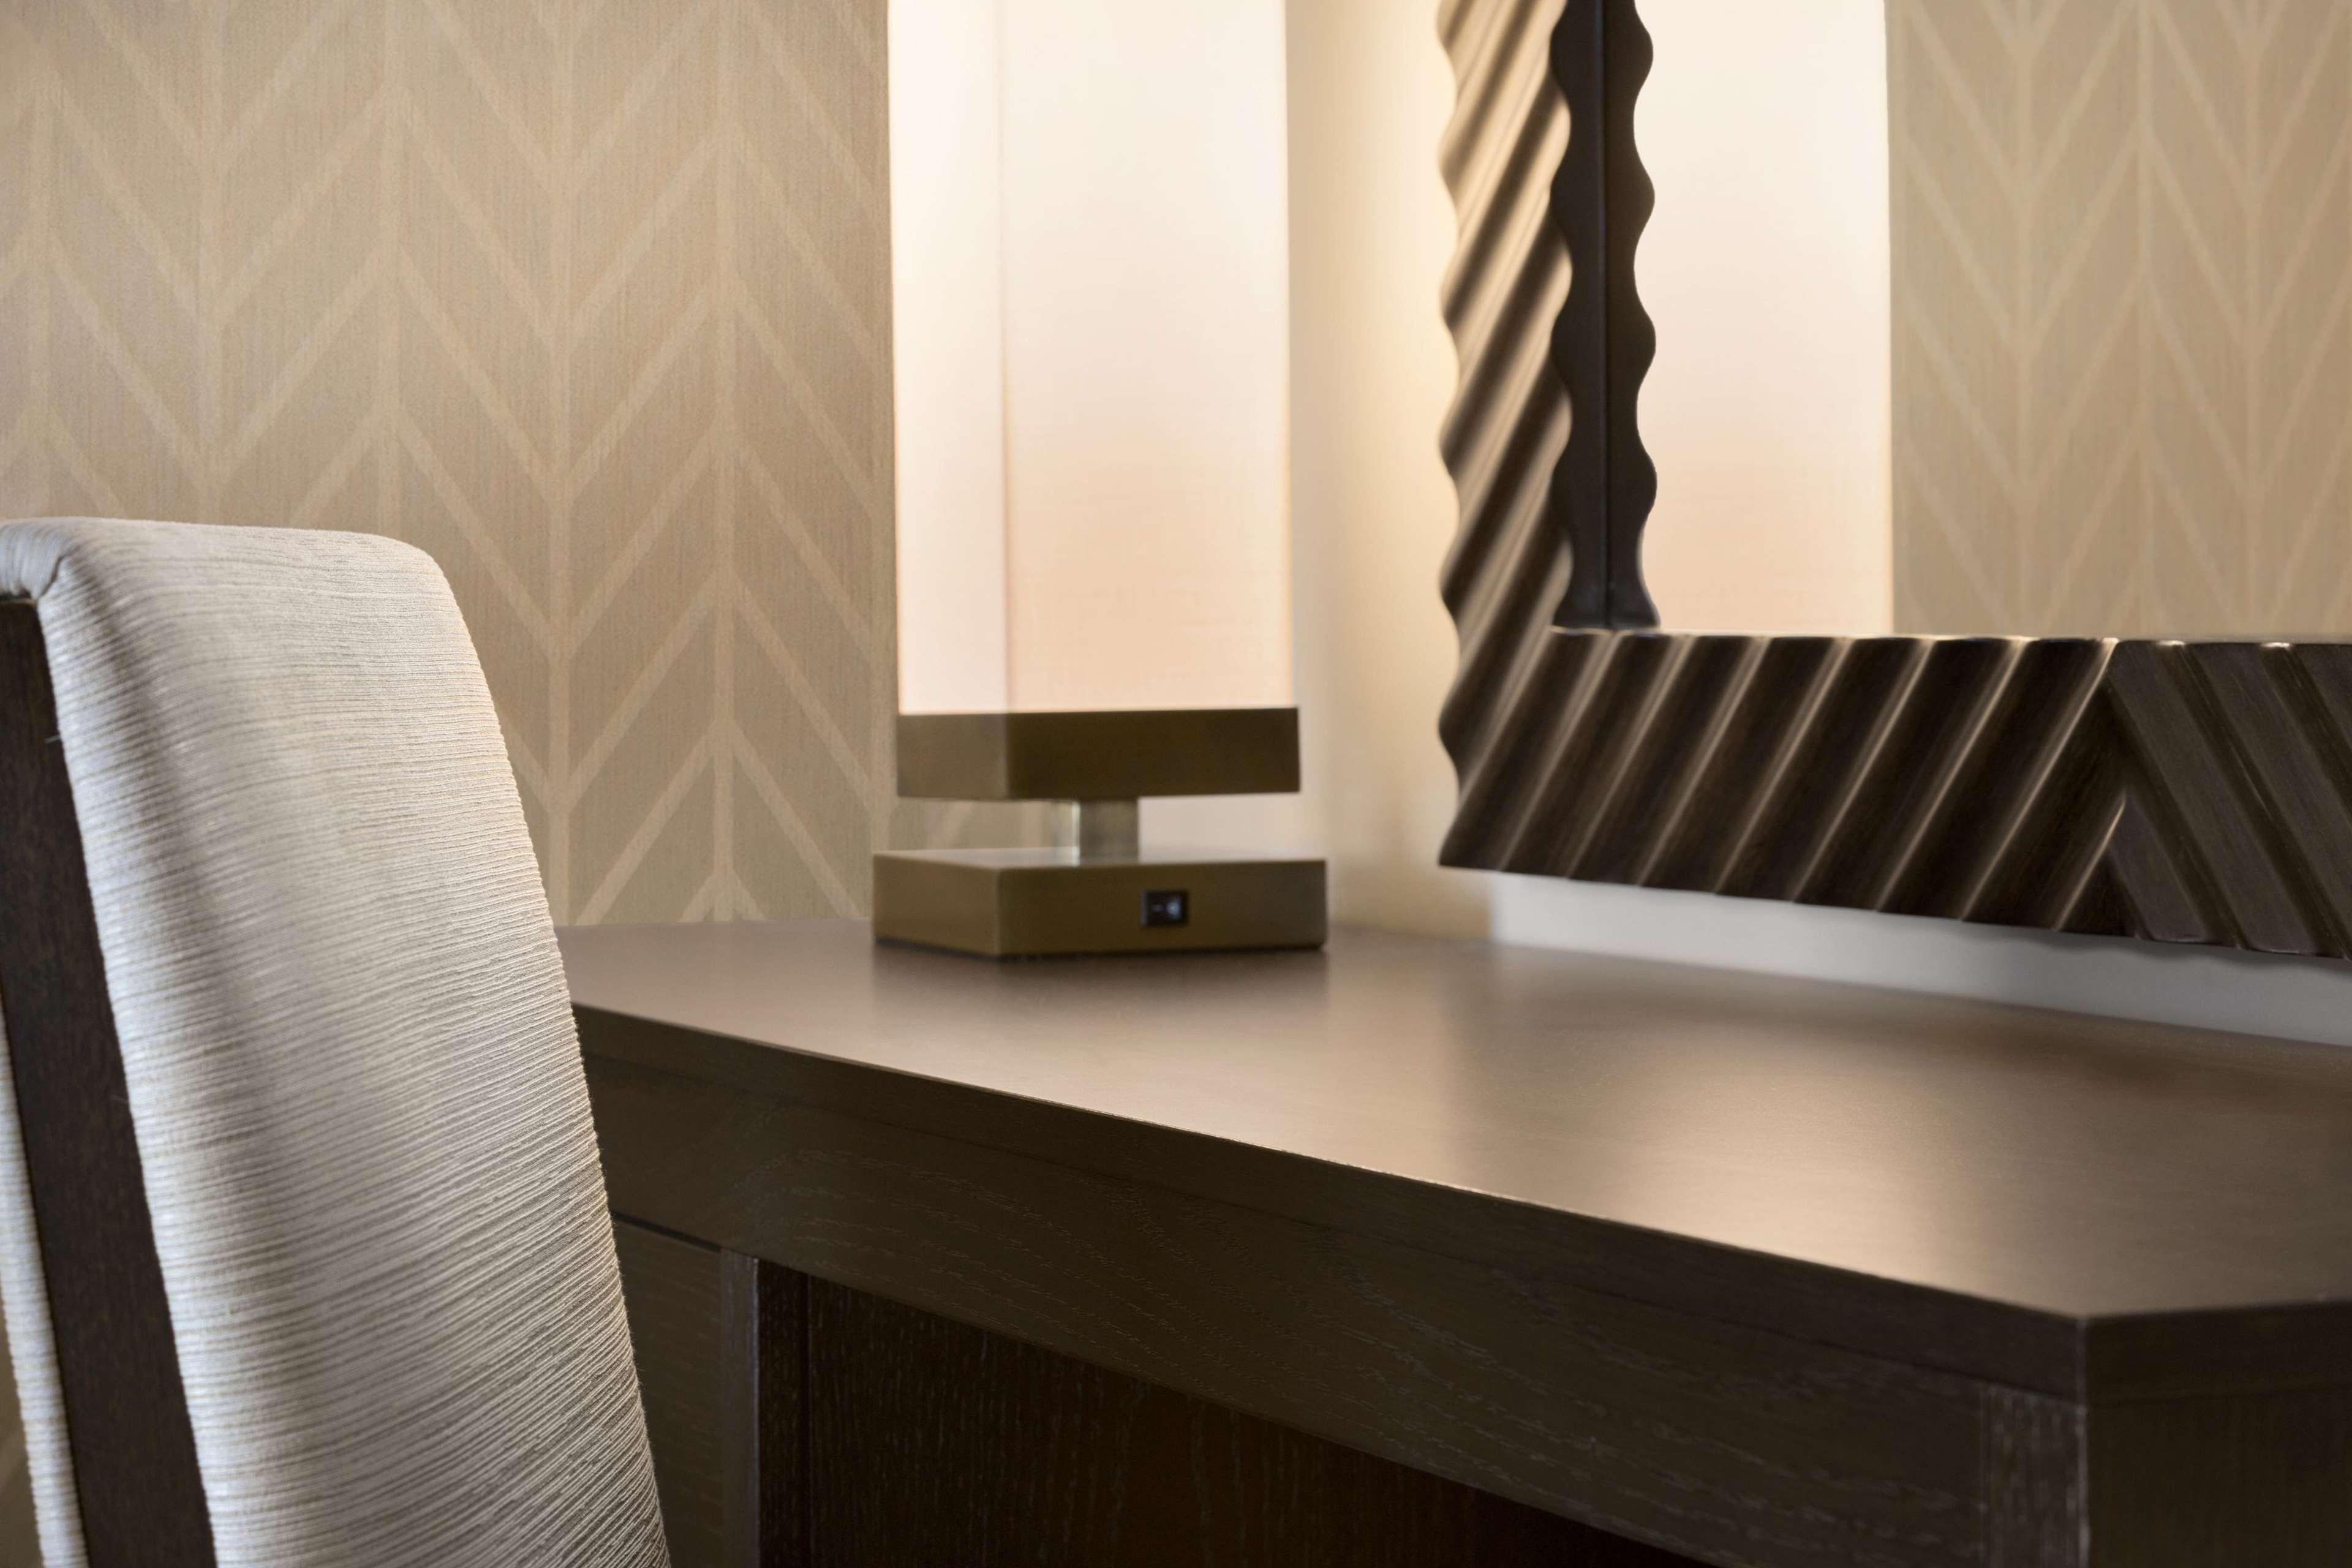 Embassy Suites by Hilton Syracuse Destiny USA image 13